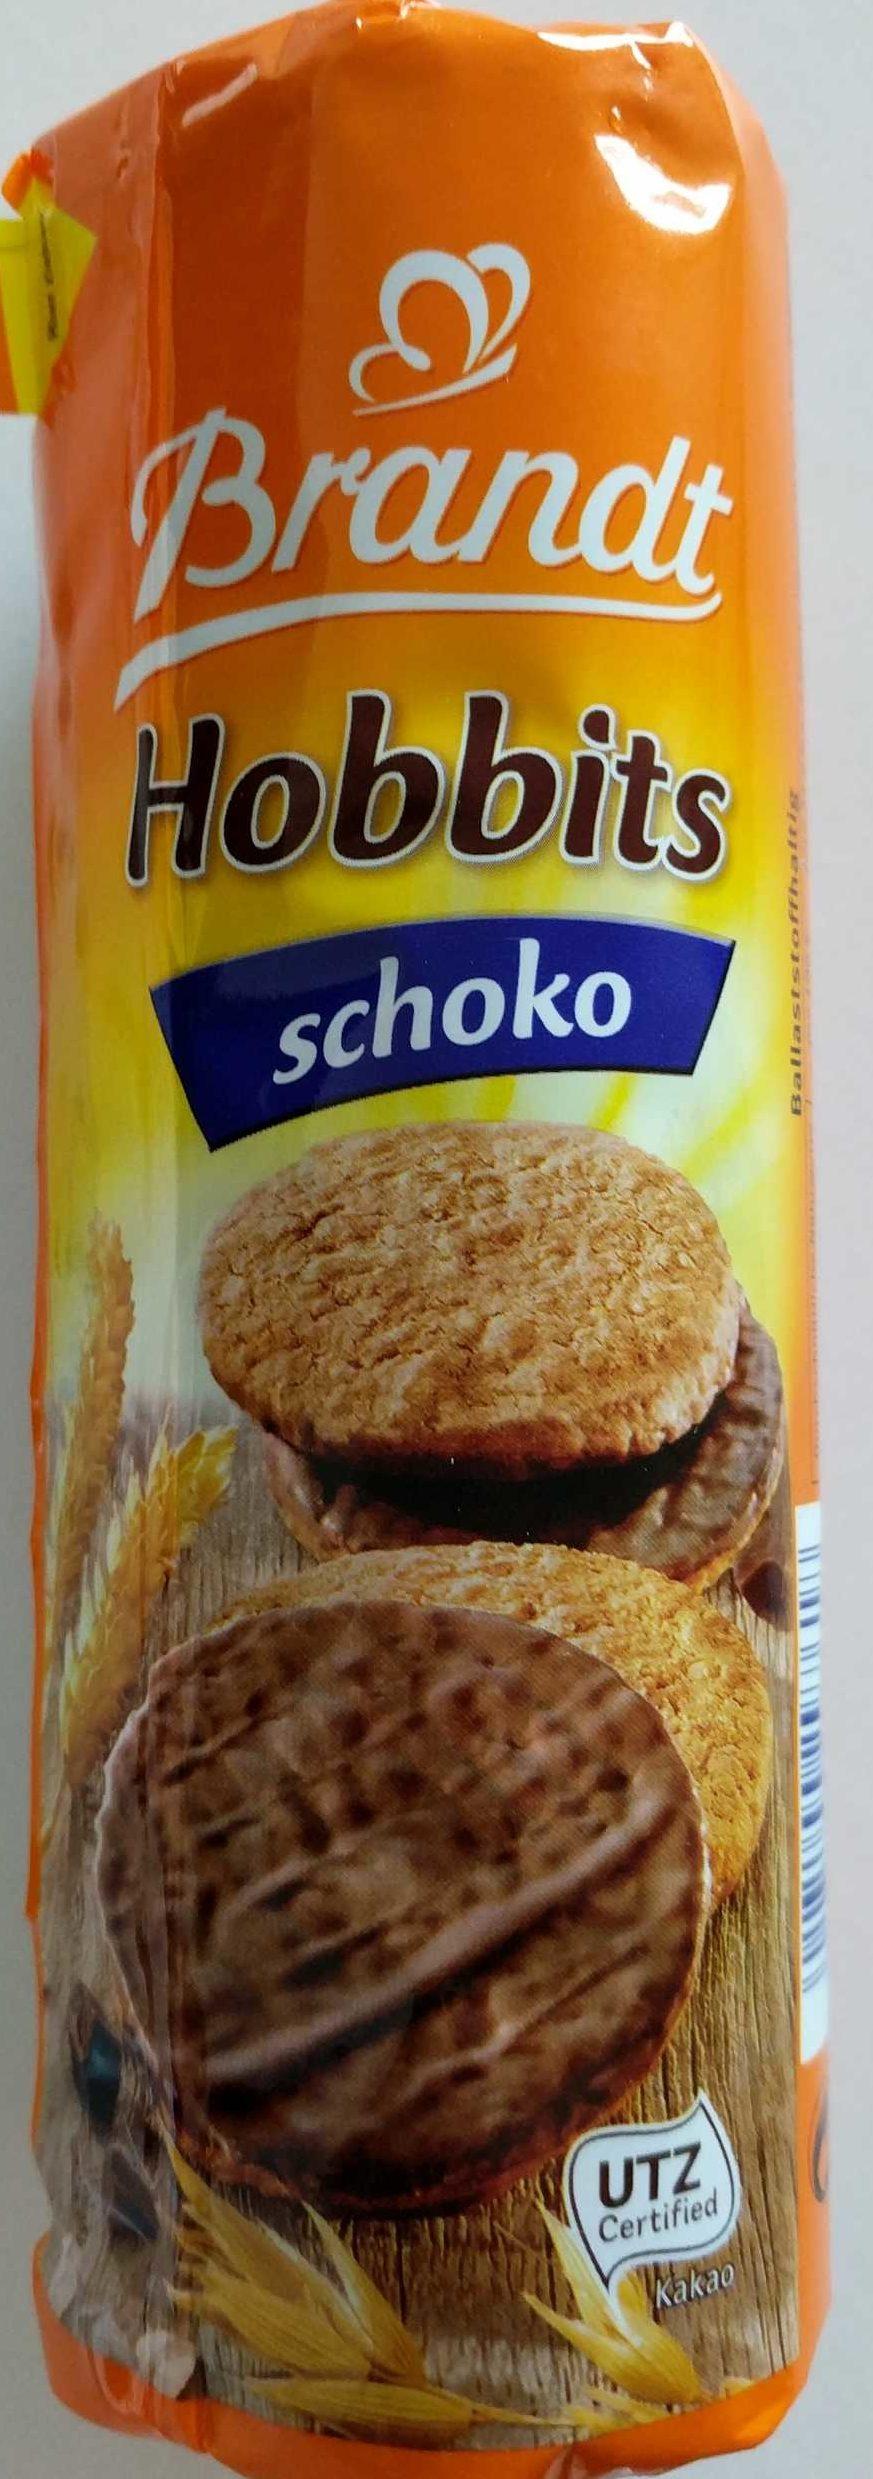 Hobbits schoko - Product